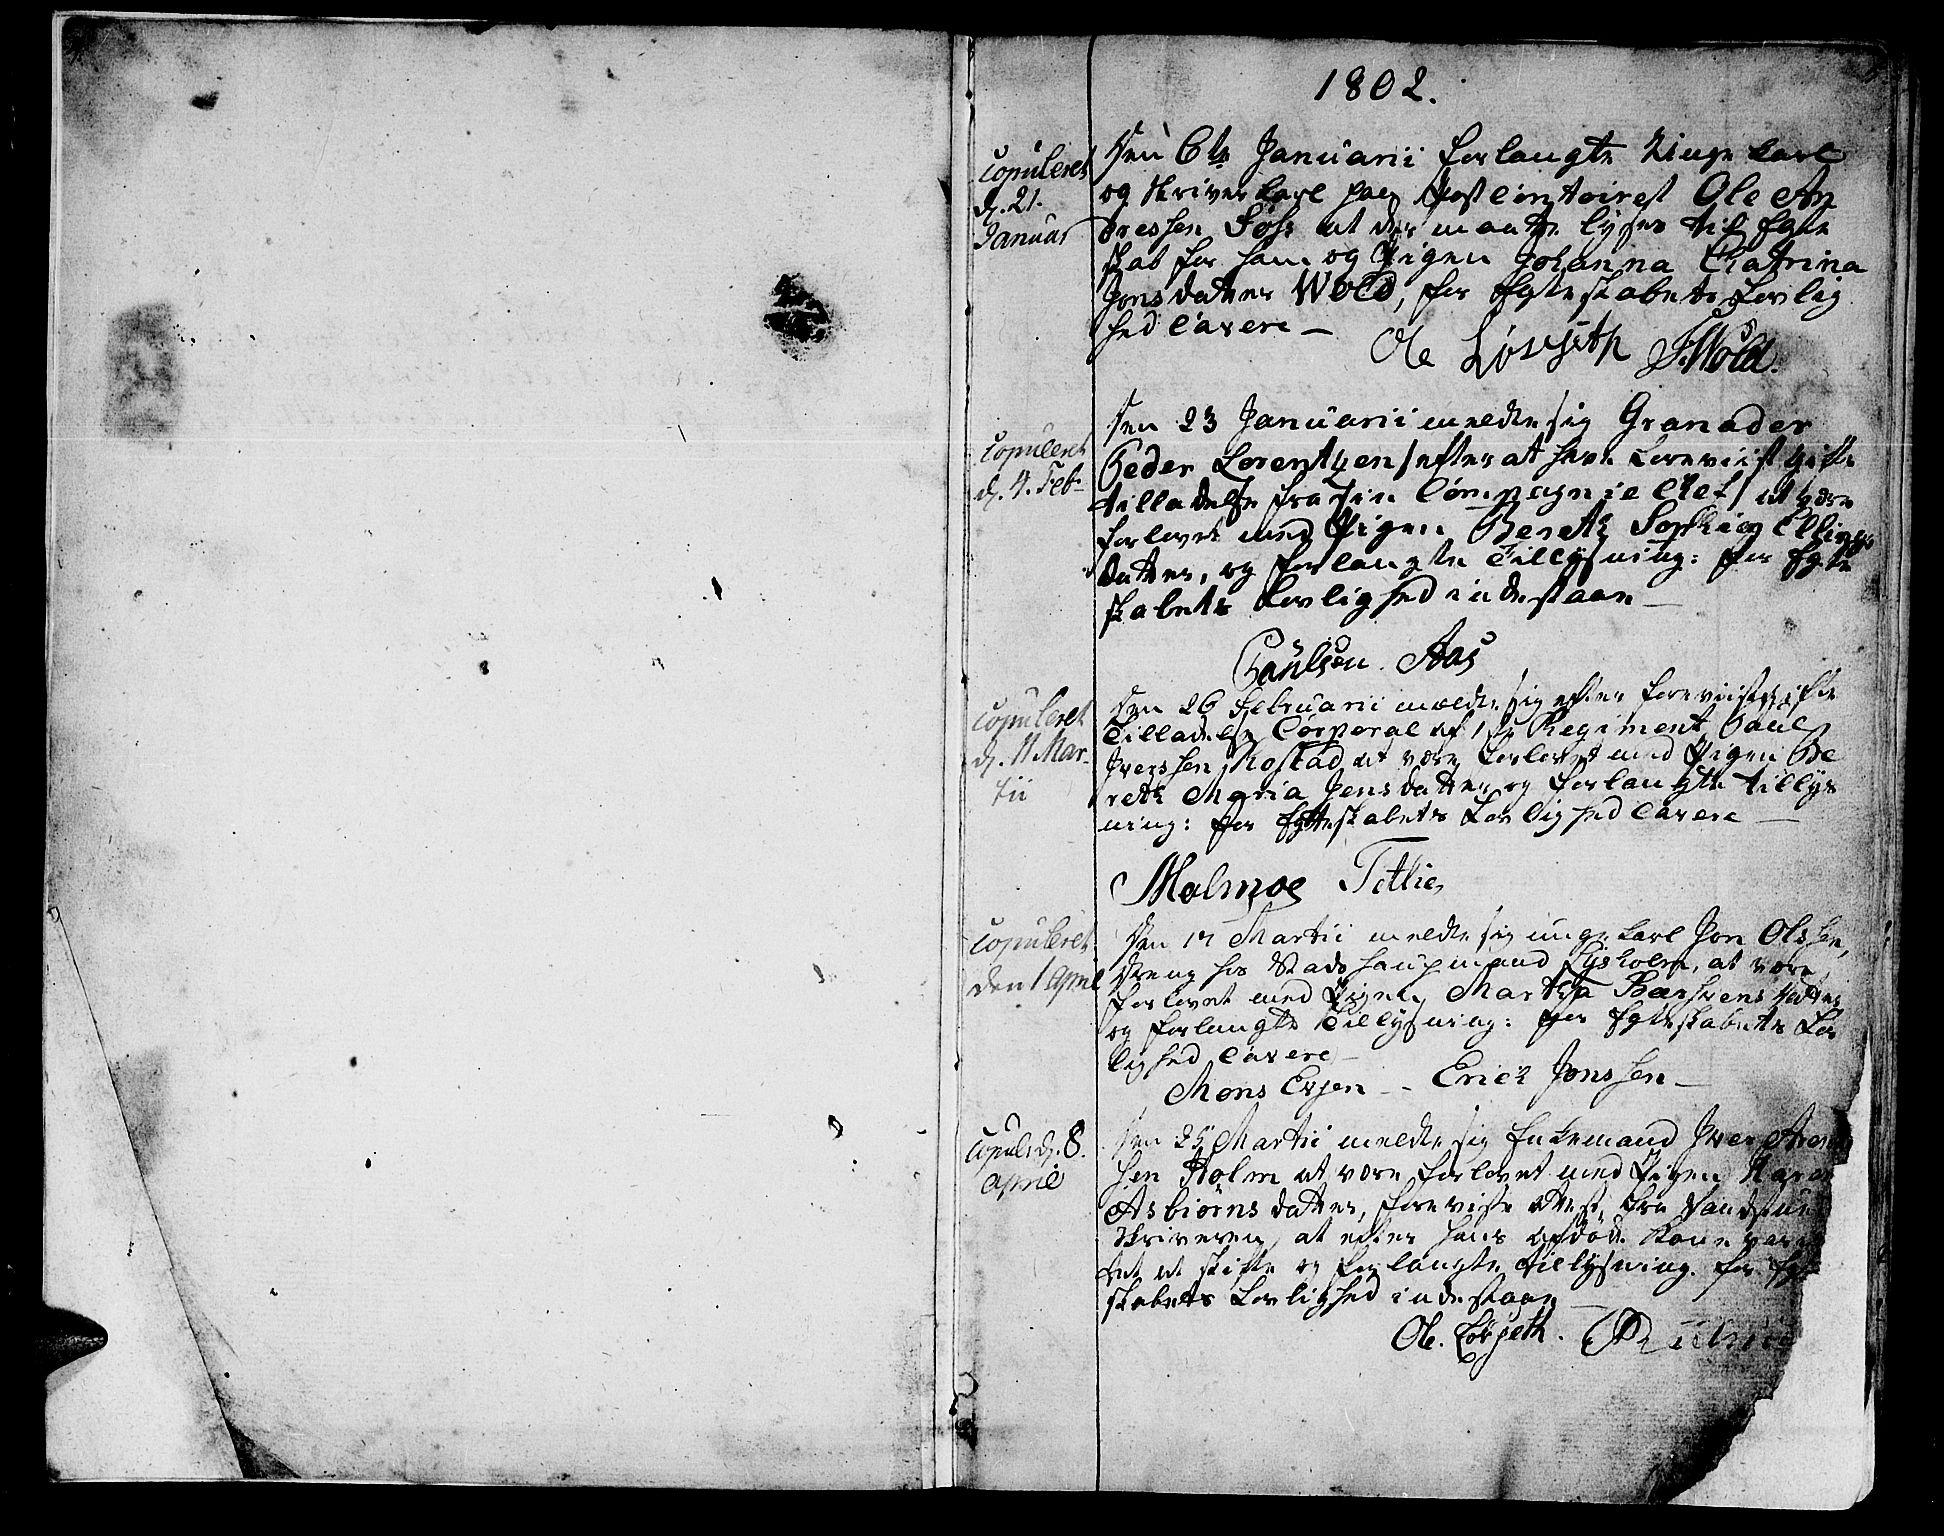 SAT, Ministerialprotokoller, klokkerbøker og fødselsregistre - Sør-Trøndelag, 601/L0042: Parish register (official) no. 601A10, 1802-1830, p. 4-5